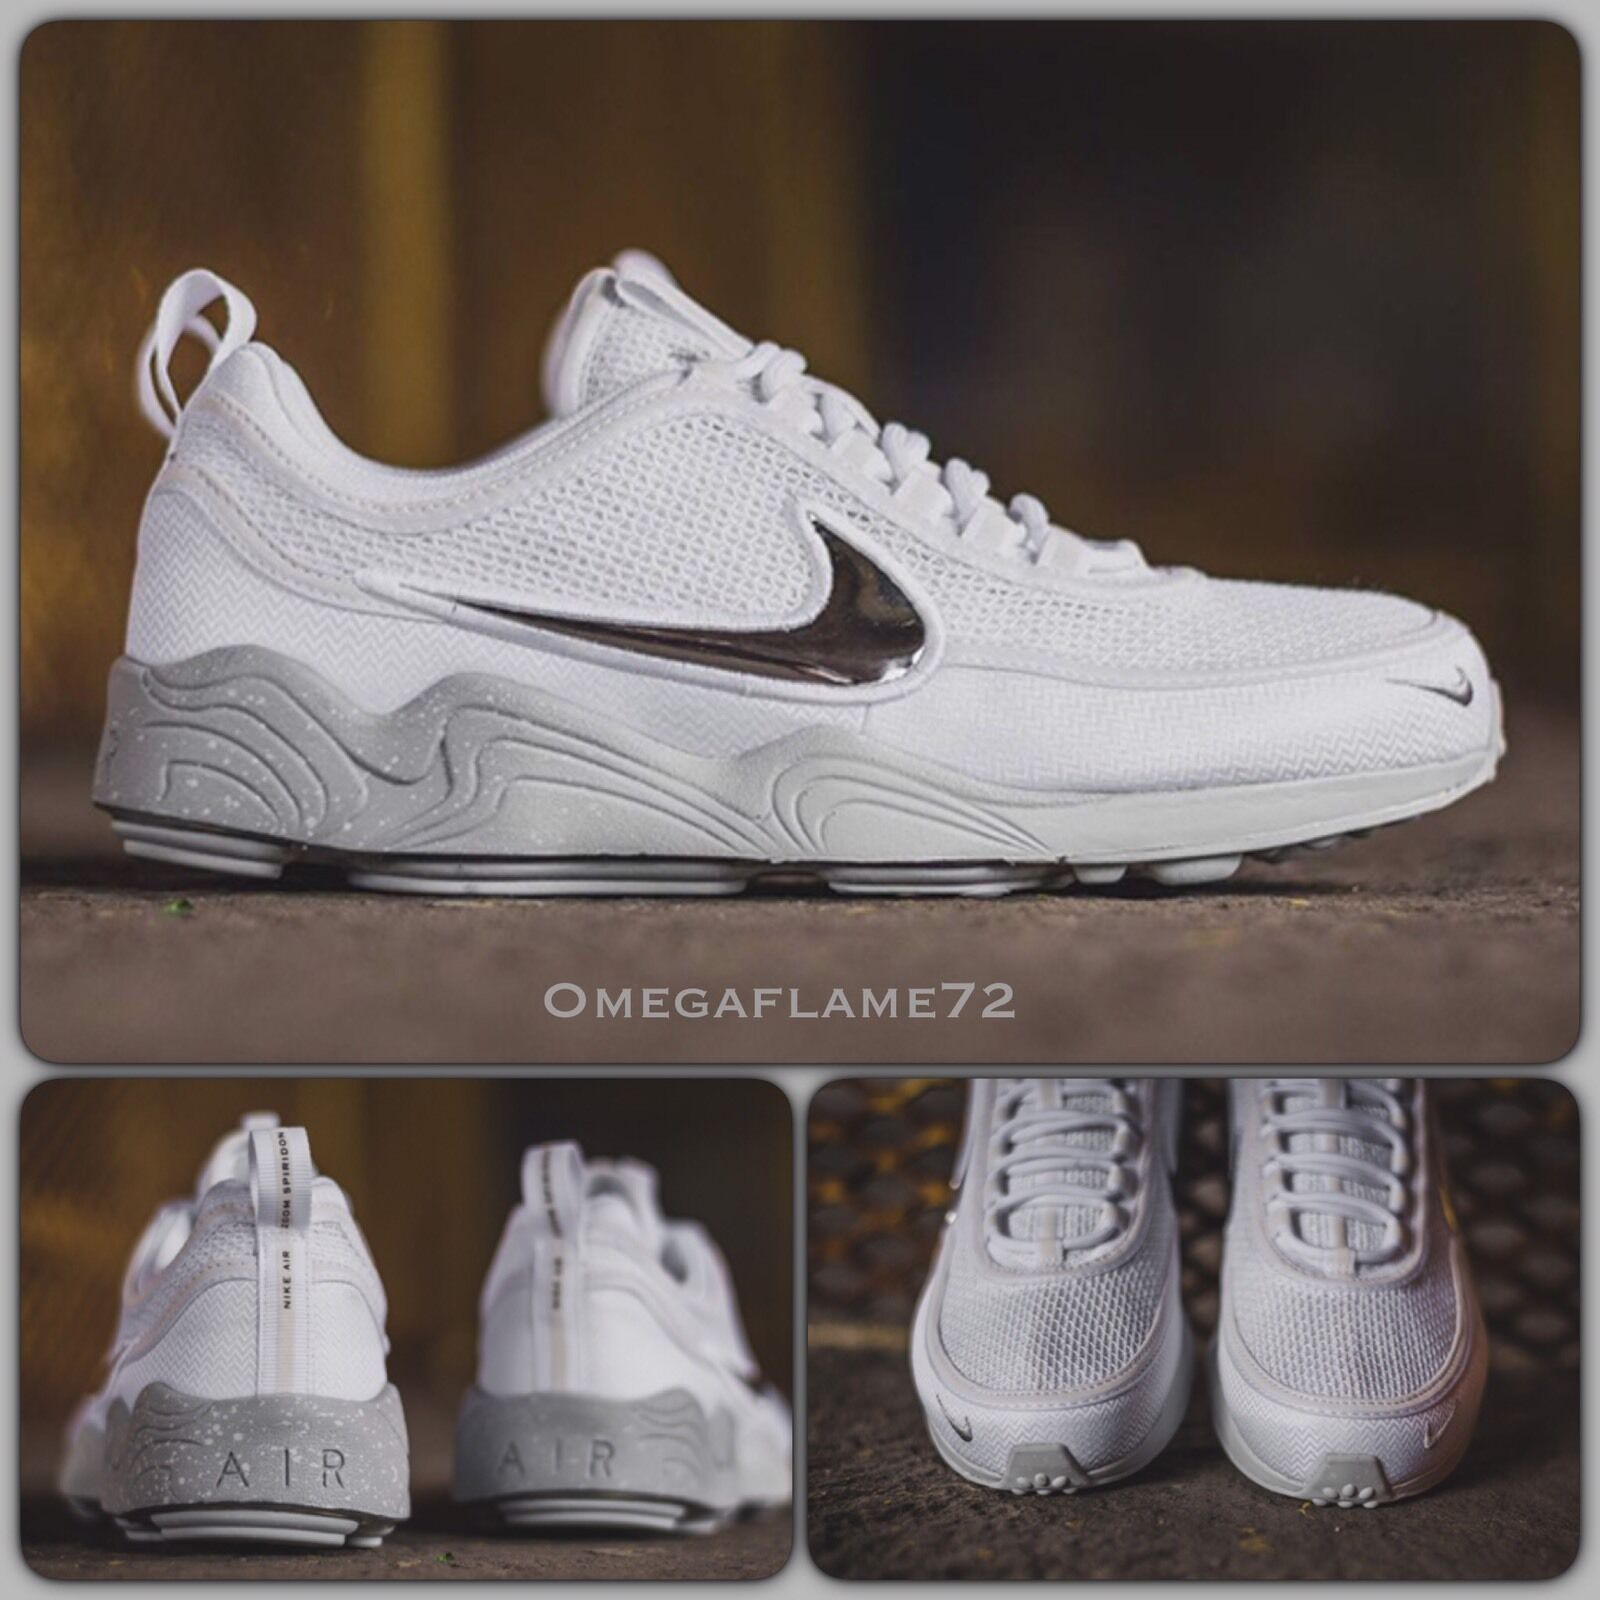 NikeLab Zoom UK Spiridon White Silver, 849776-100, UK Zoom 7.5, EU 42, US 8.5 nike 968084